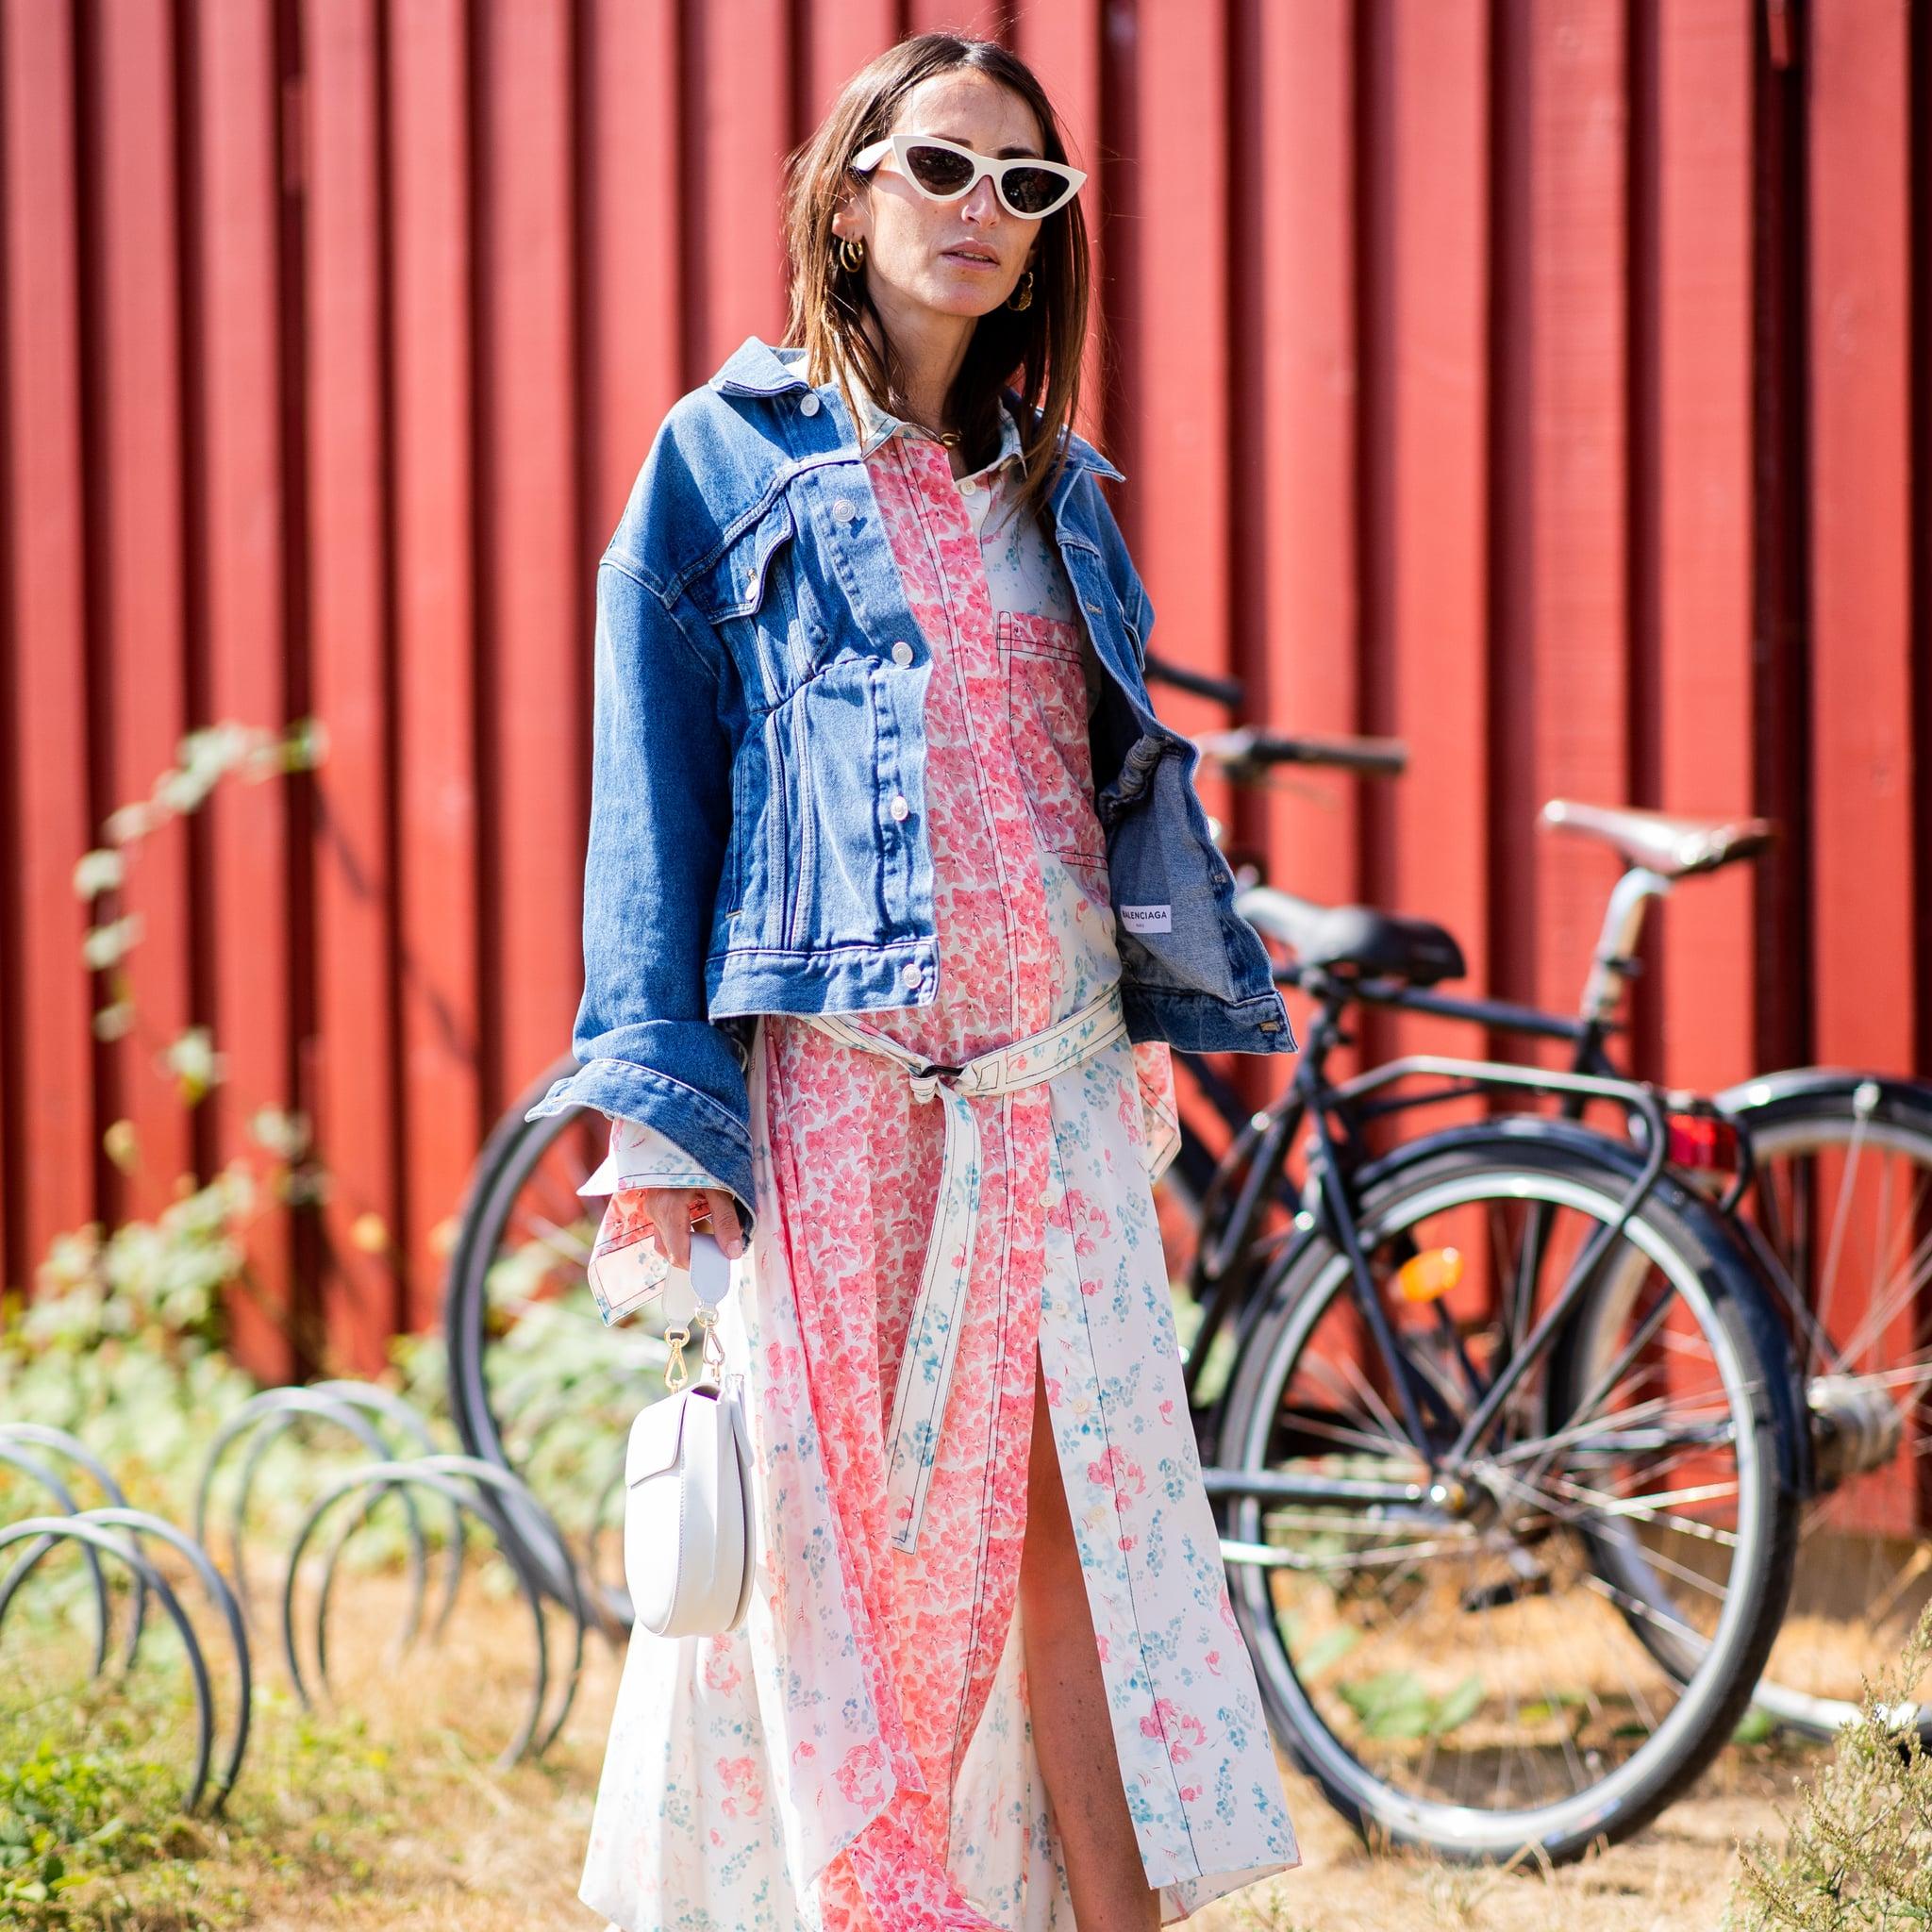 Denim Jacket Outfit Ideas For Spring and Summer  POPSUGAR Fashion